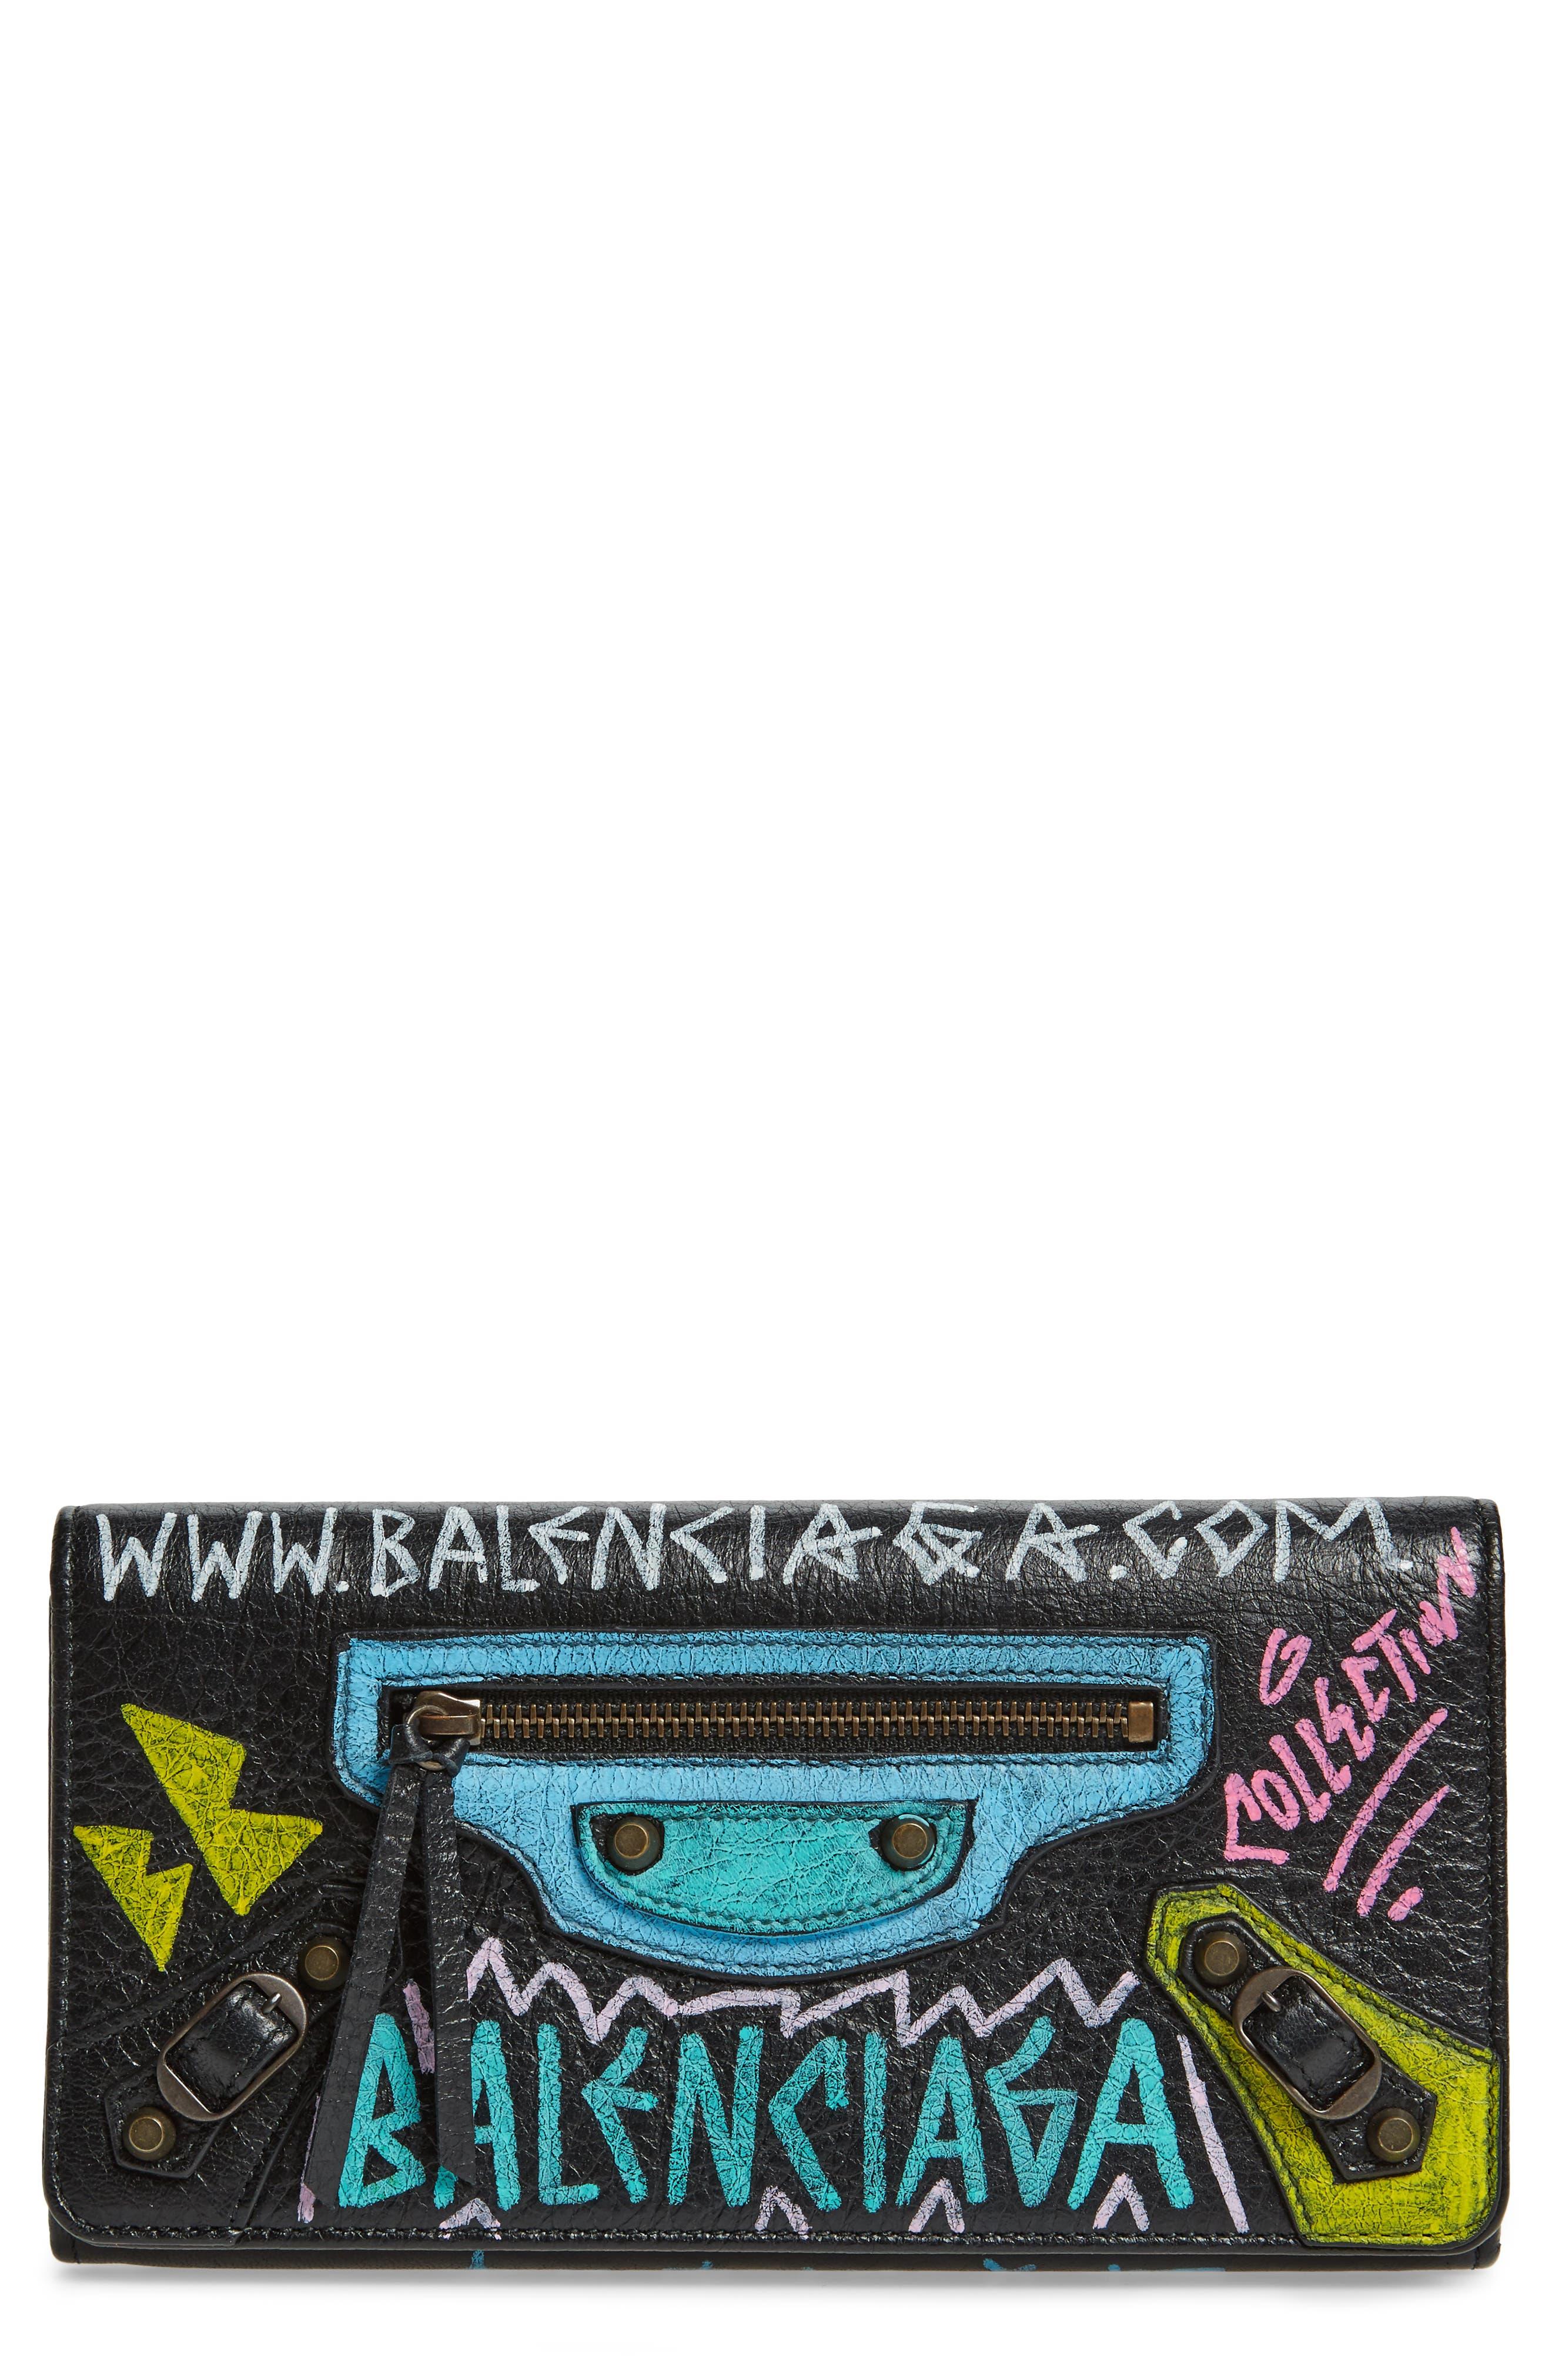 Alternate Image 1 Selected - Balenciaga Classic Graffiti Leather Wallet